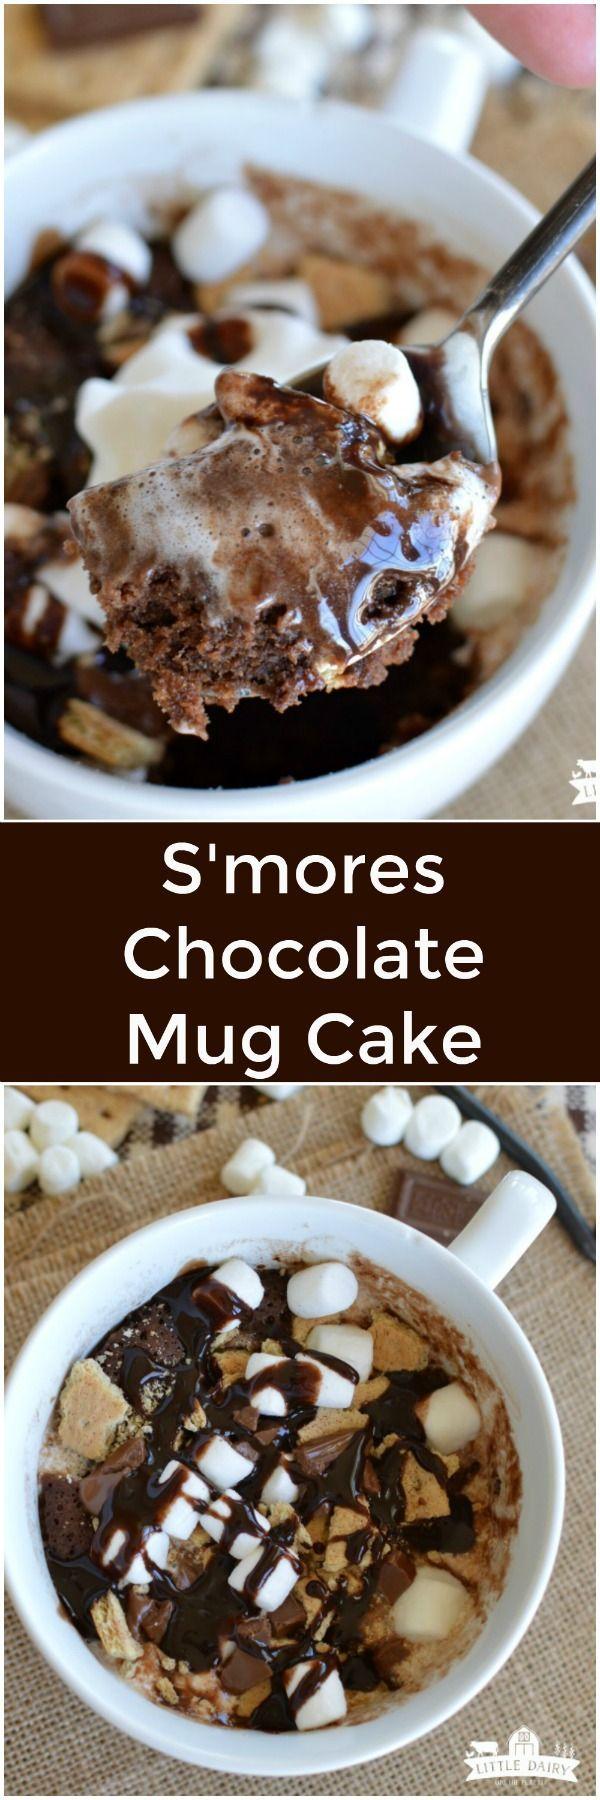 25+ best Chocolate chip mug cake ideas on Pinterest | Chocolate ...